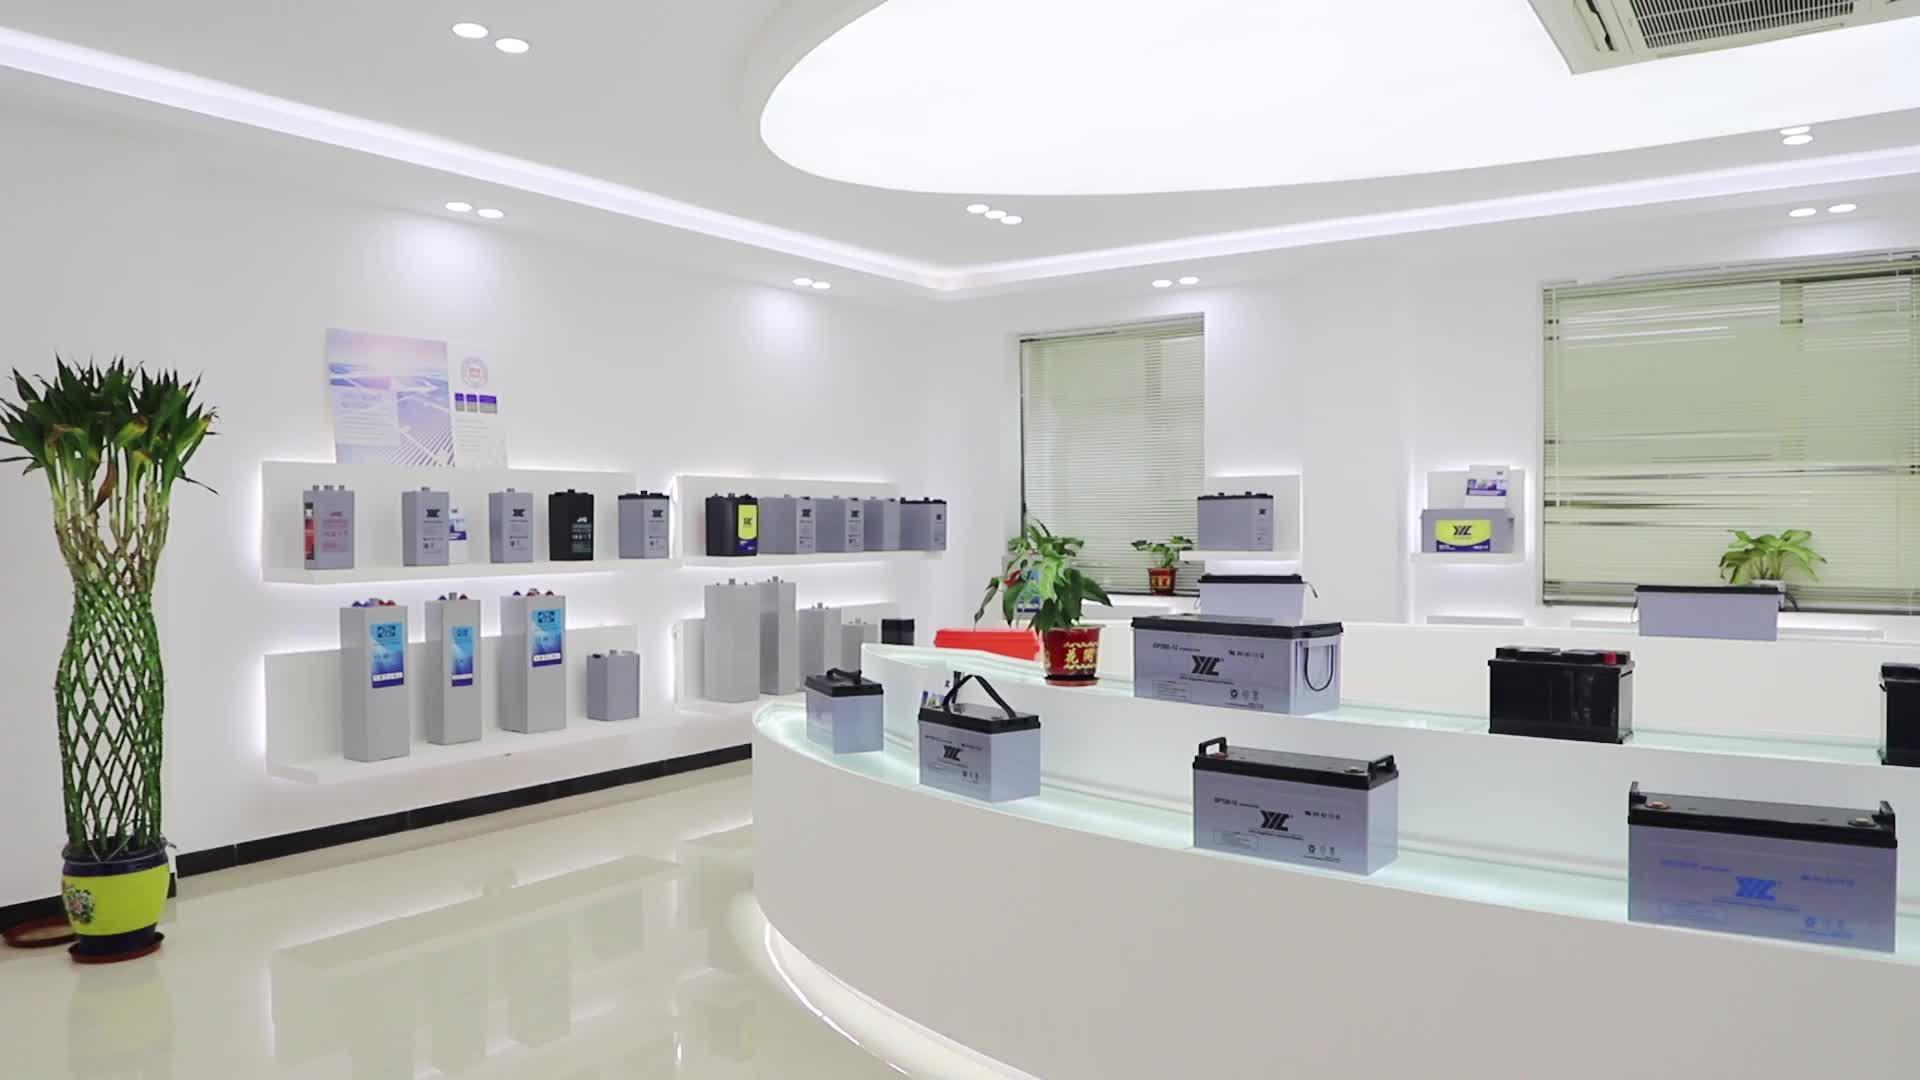 Newest hot selling gel battery 12v 12ah